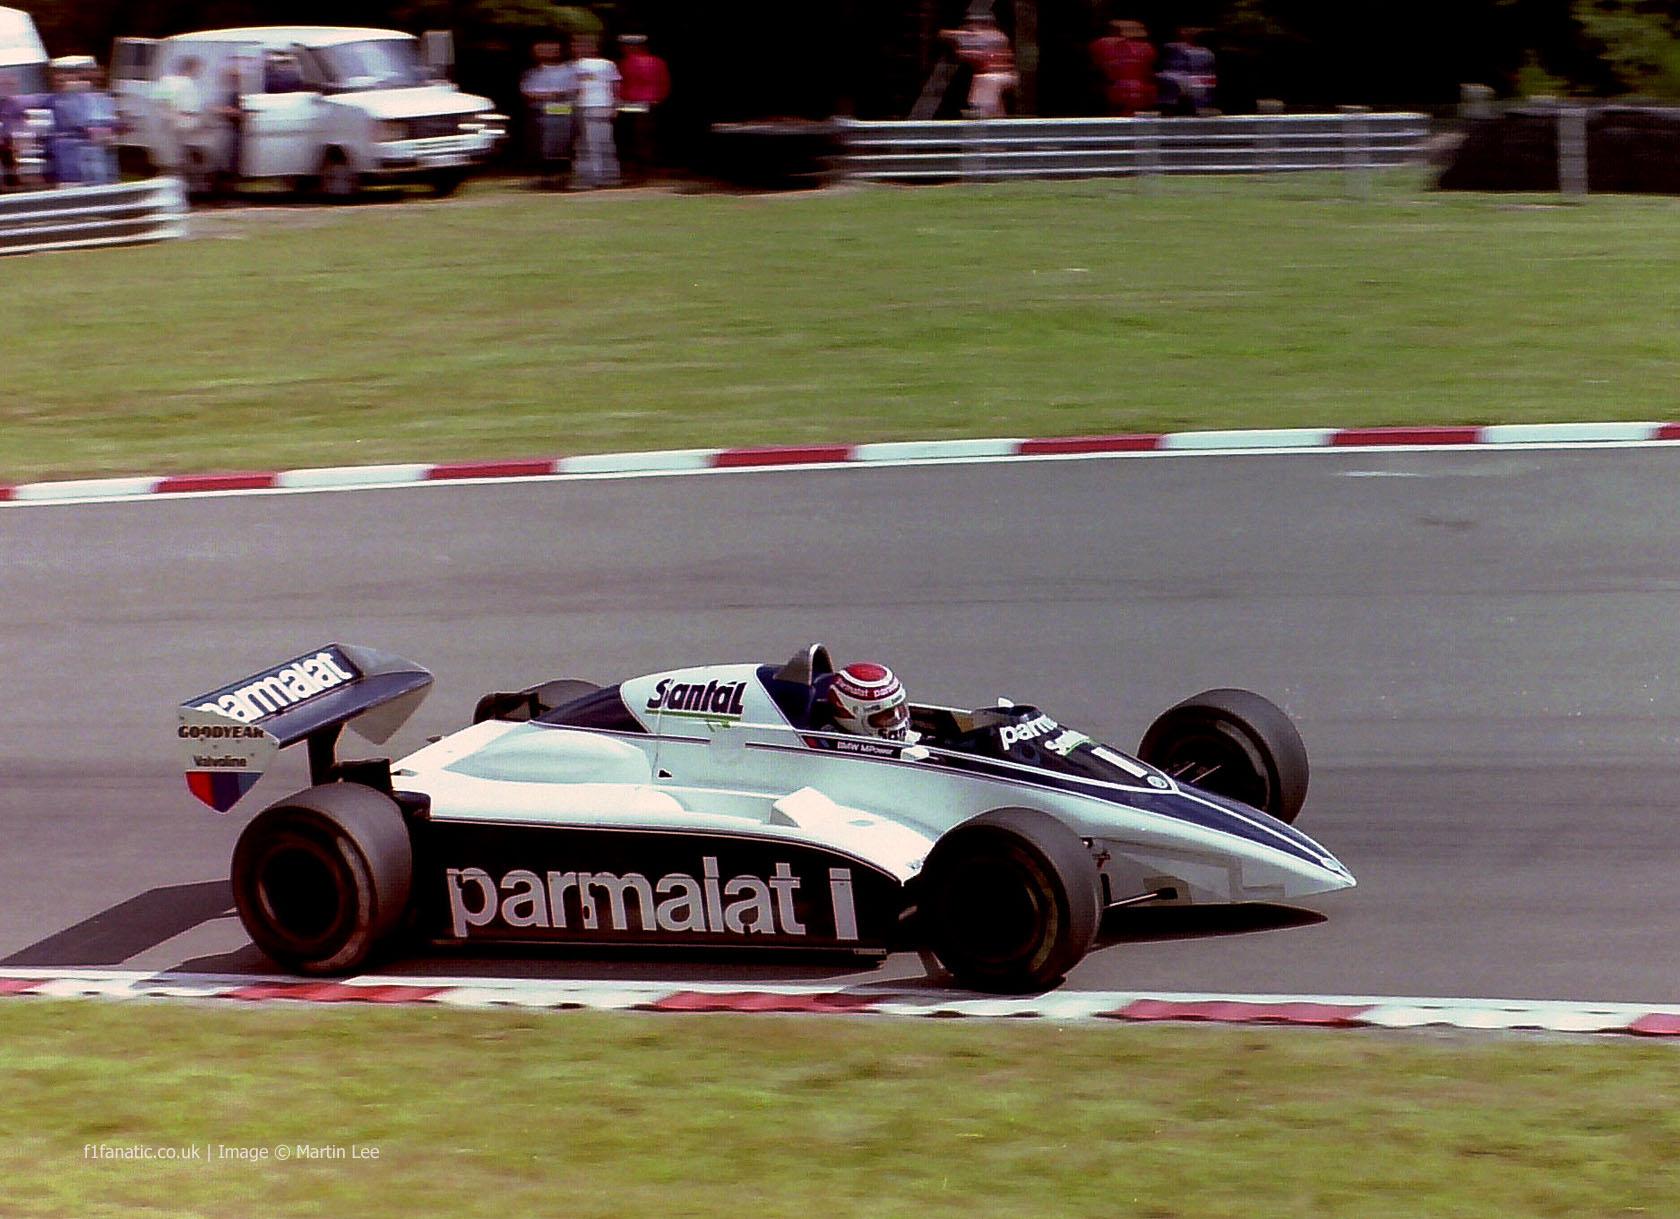 Nelson Piquet, Brabham, Brands Hatch, 1982